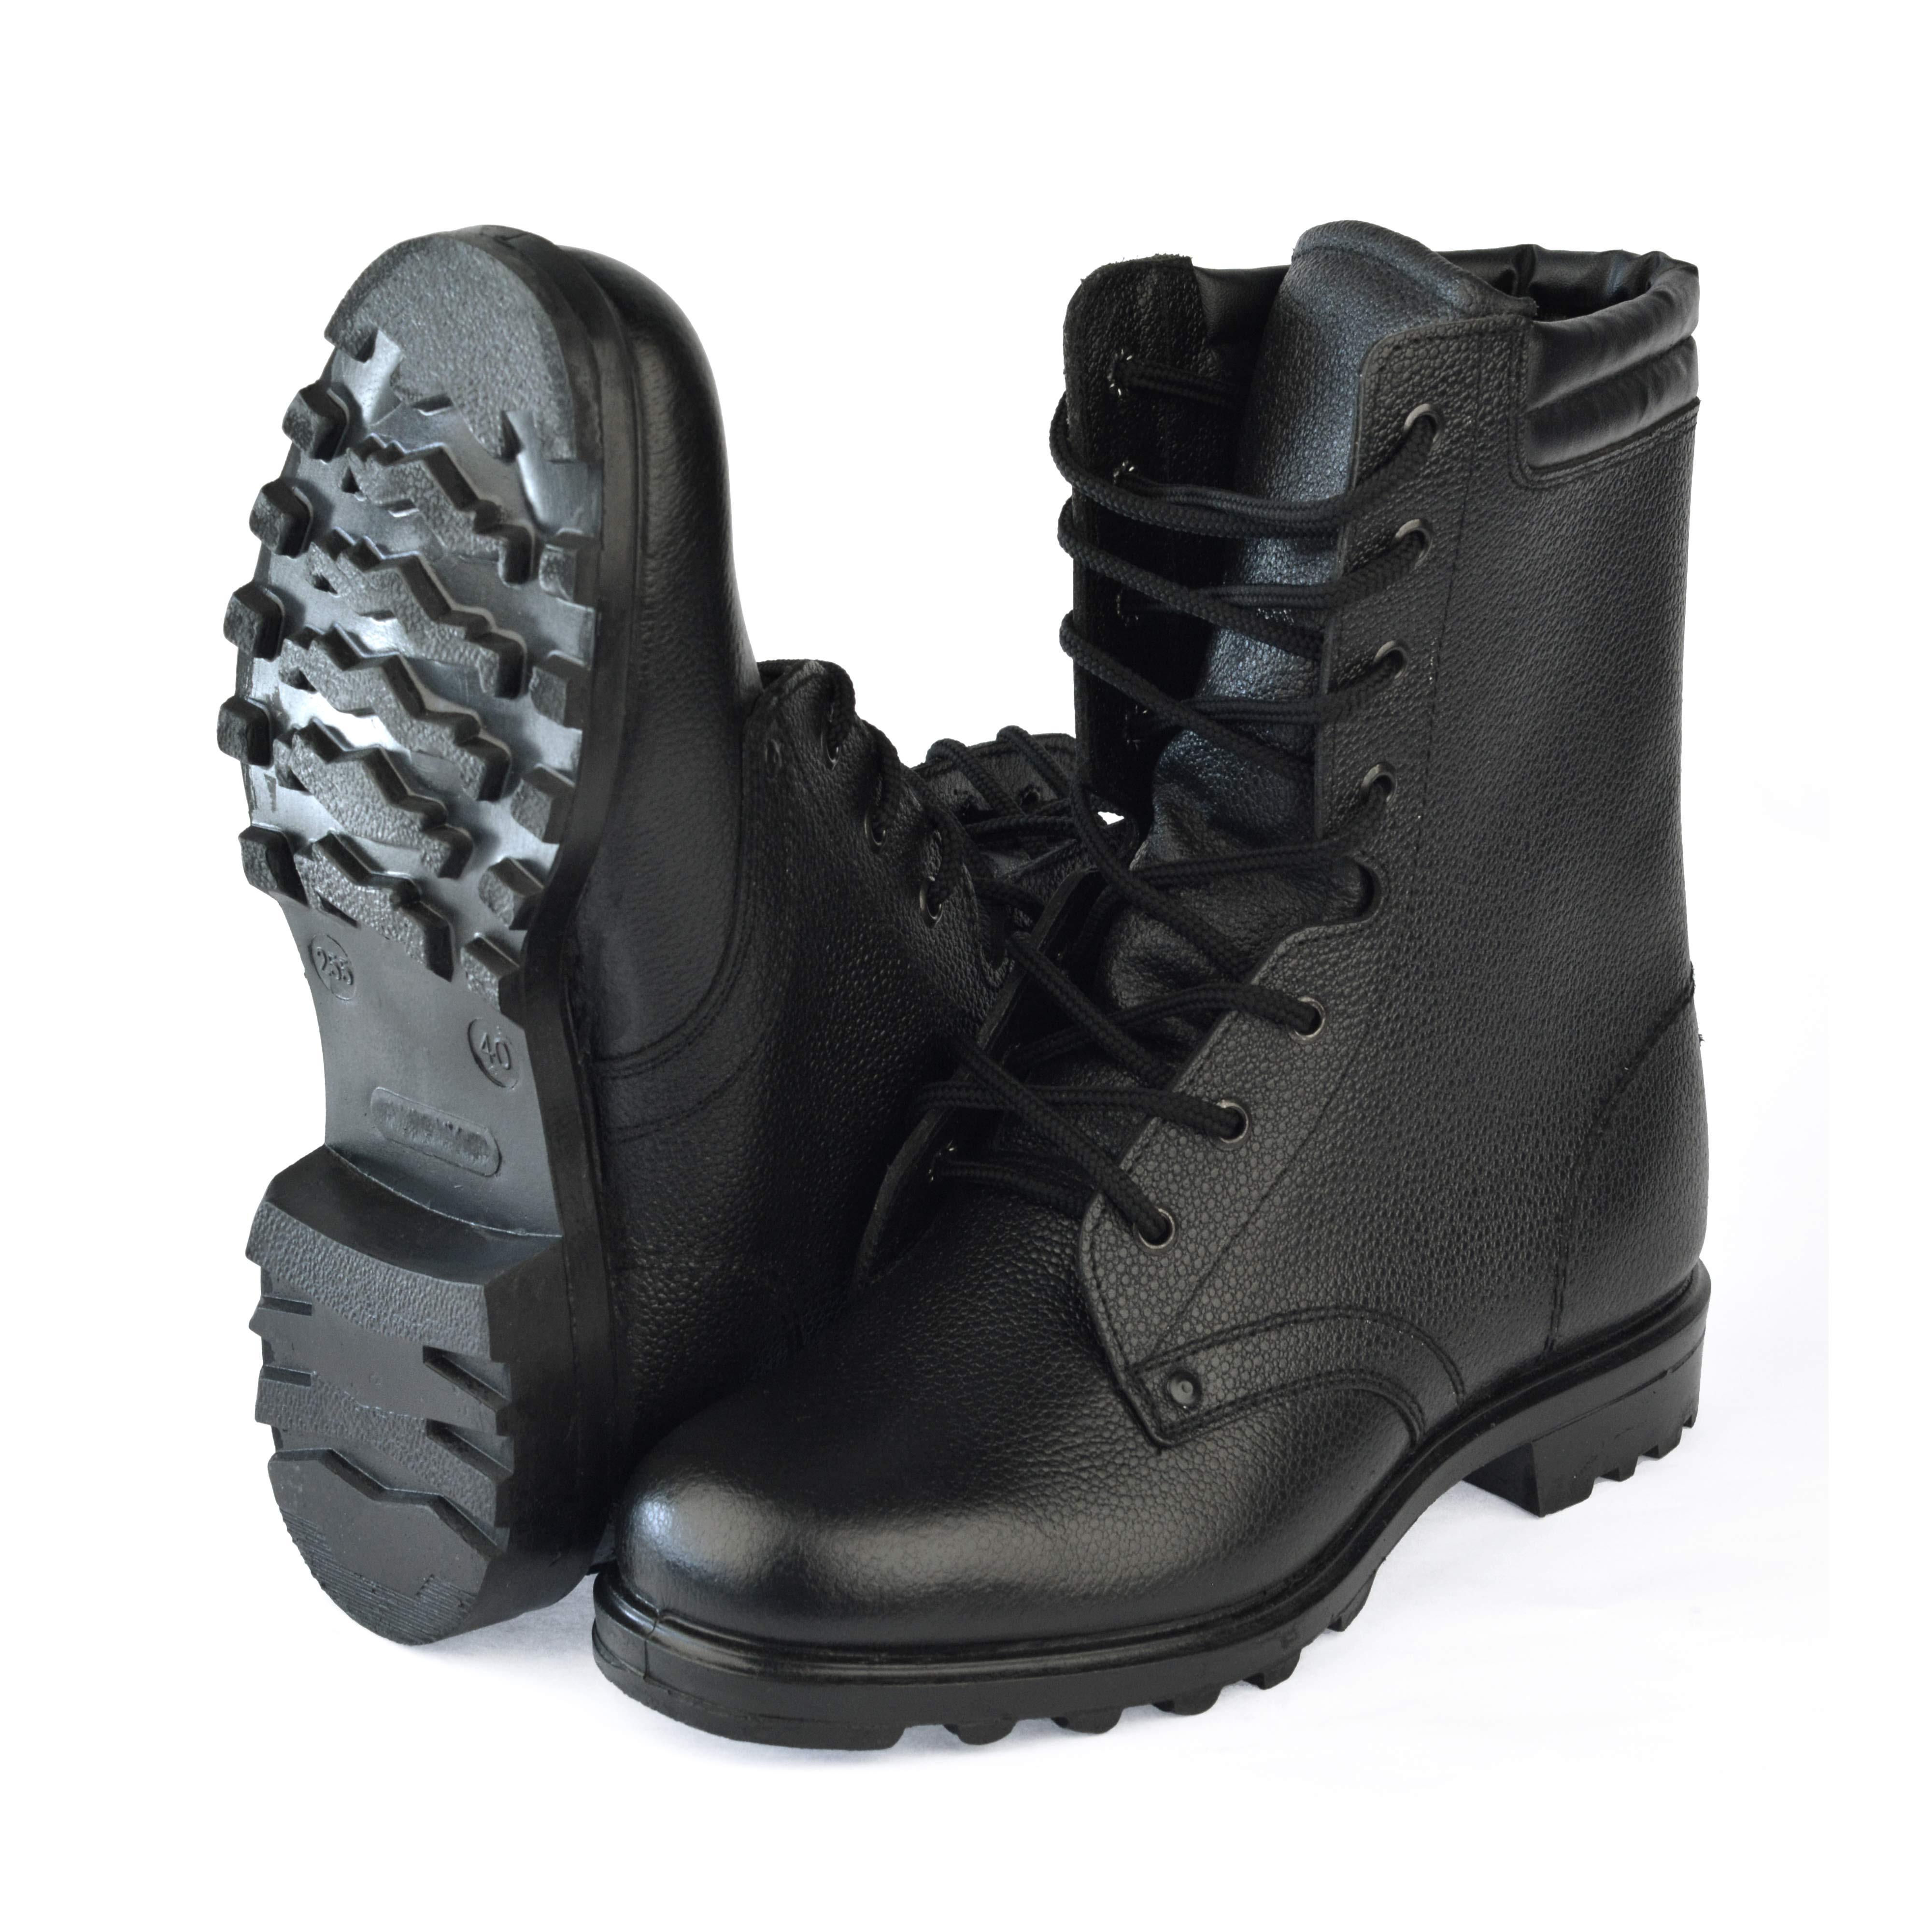 80586f7d81ad Ботинки с высокими берцами Армейские верх-юфть, подошва-резина ...